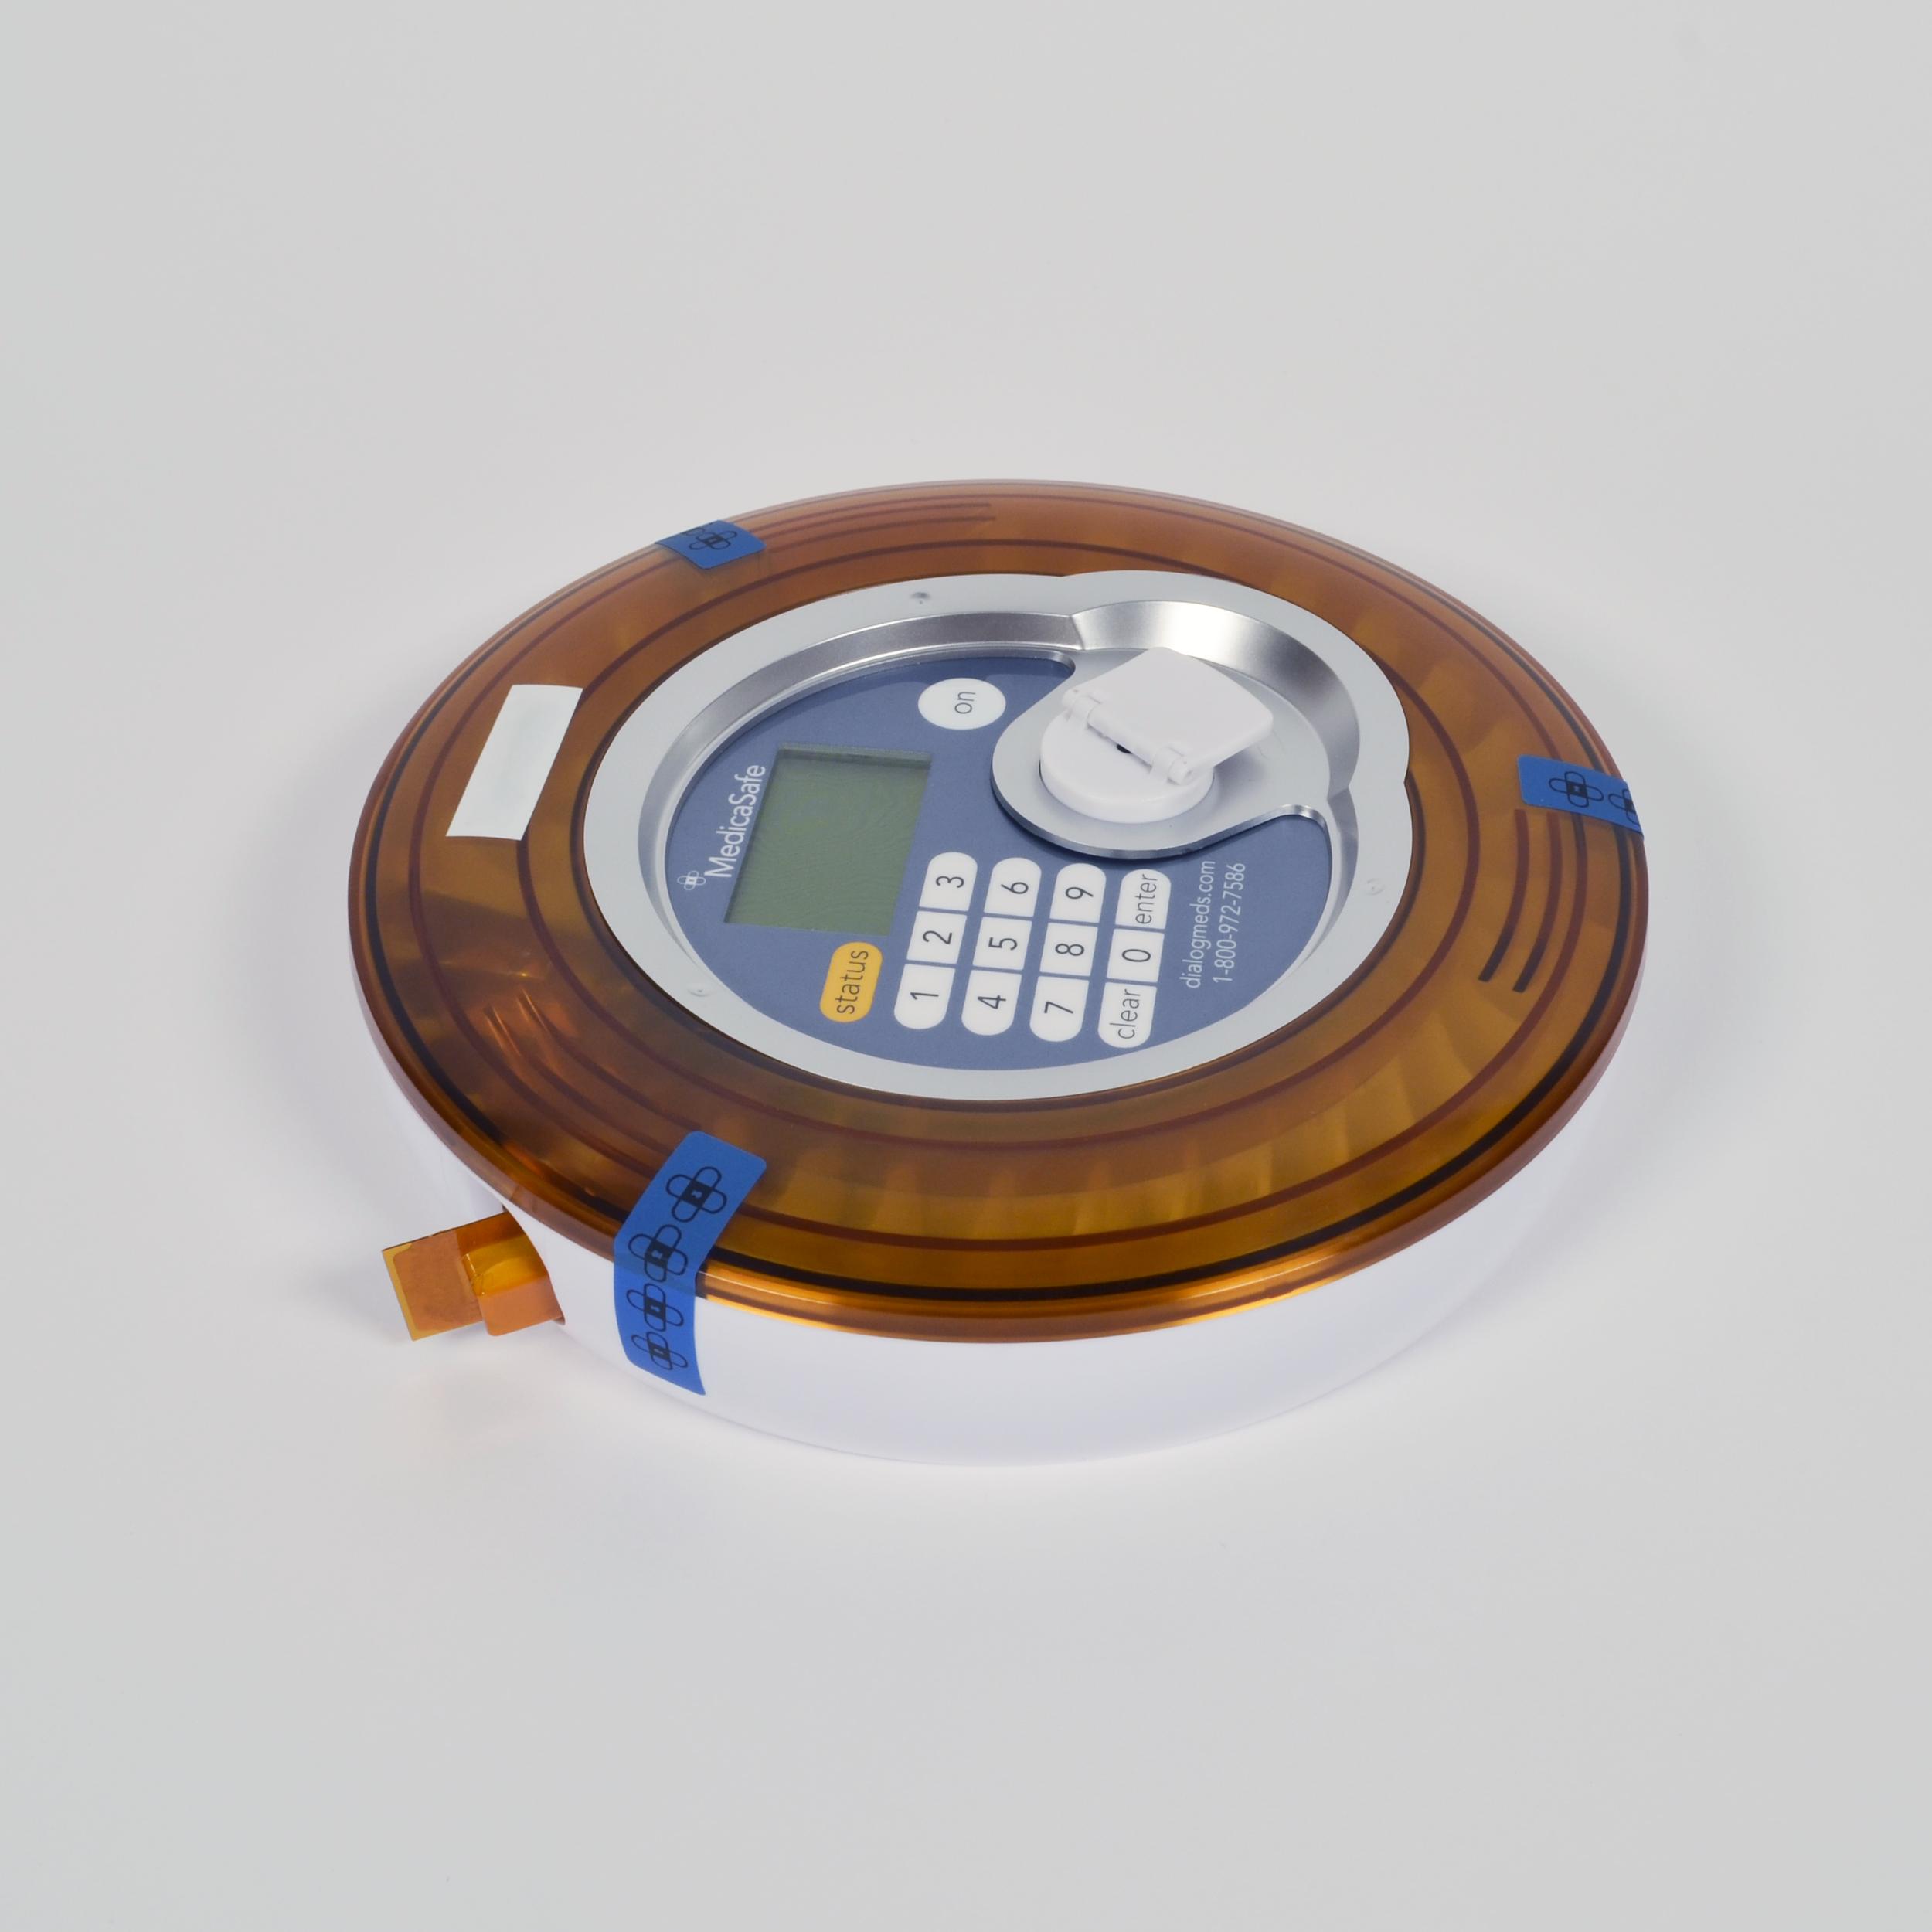 The original MedicaSafe device